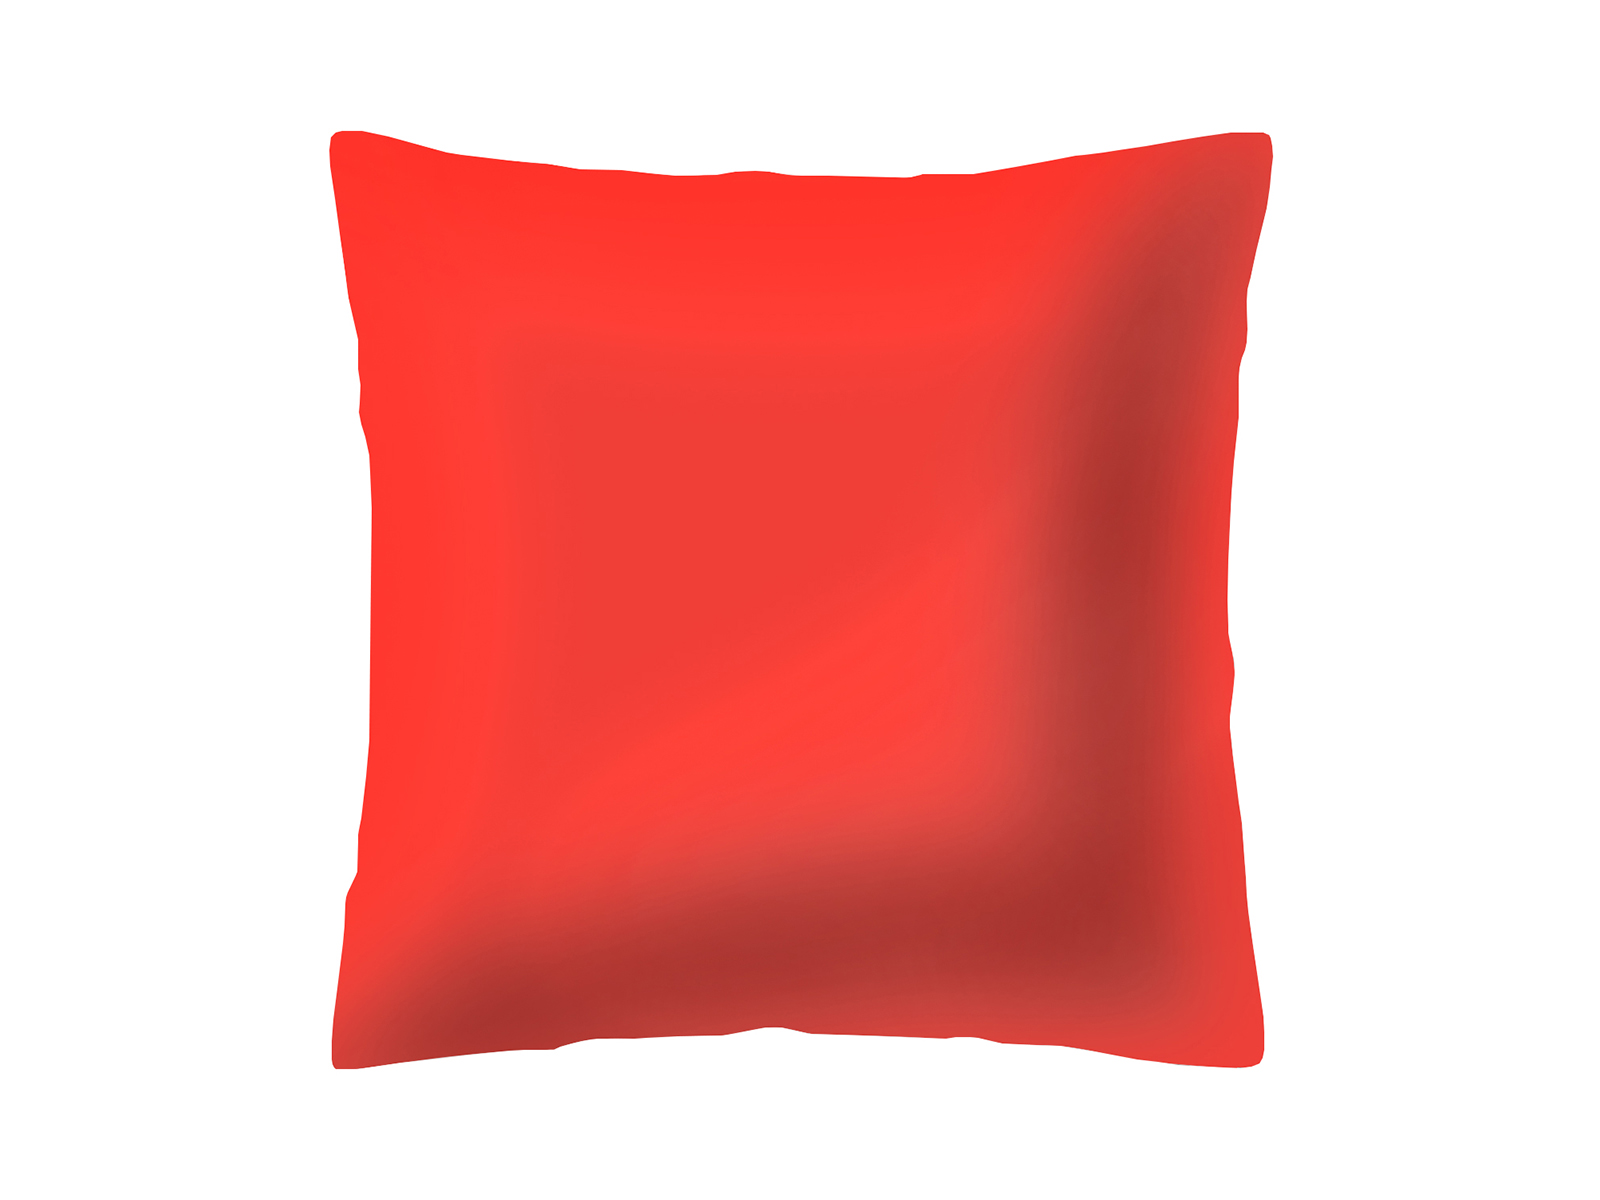 Подушка ColorДекоративные подушки<br>Декоративная подушка со съемным чехлом<br>